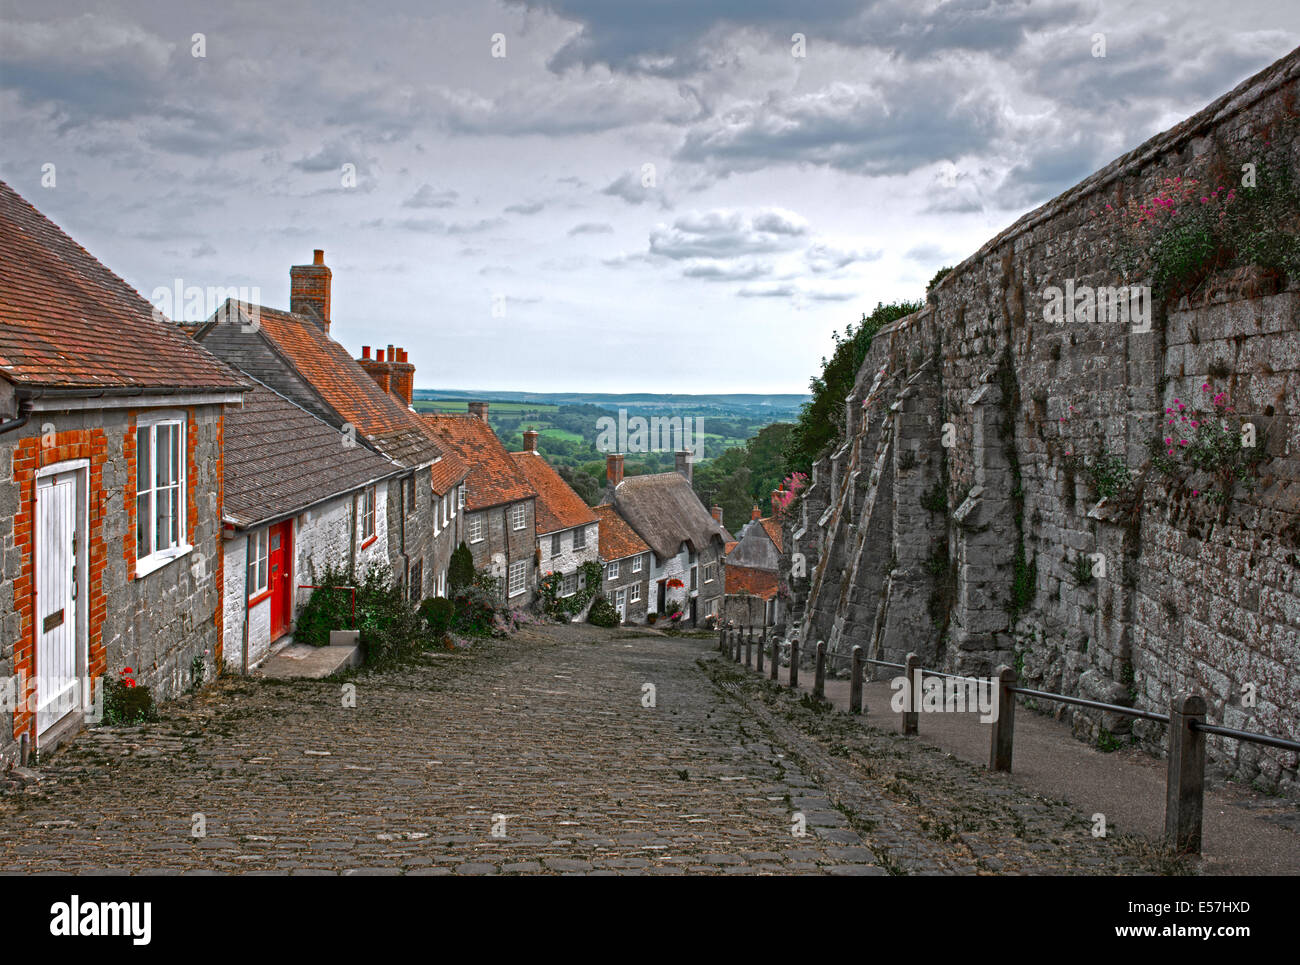 Gold Hill, Shaftesbury, (Hovis T.v  Advert)  Dorset, England, Uk. - Stock Image